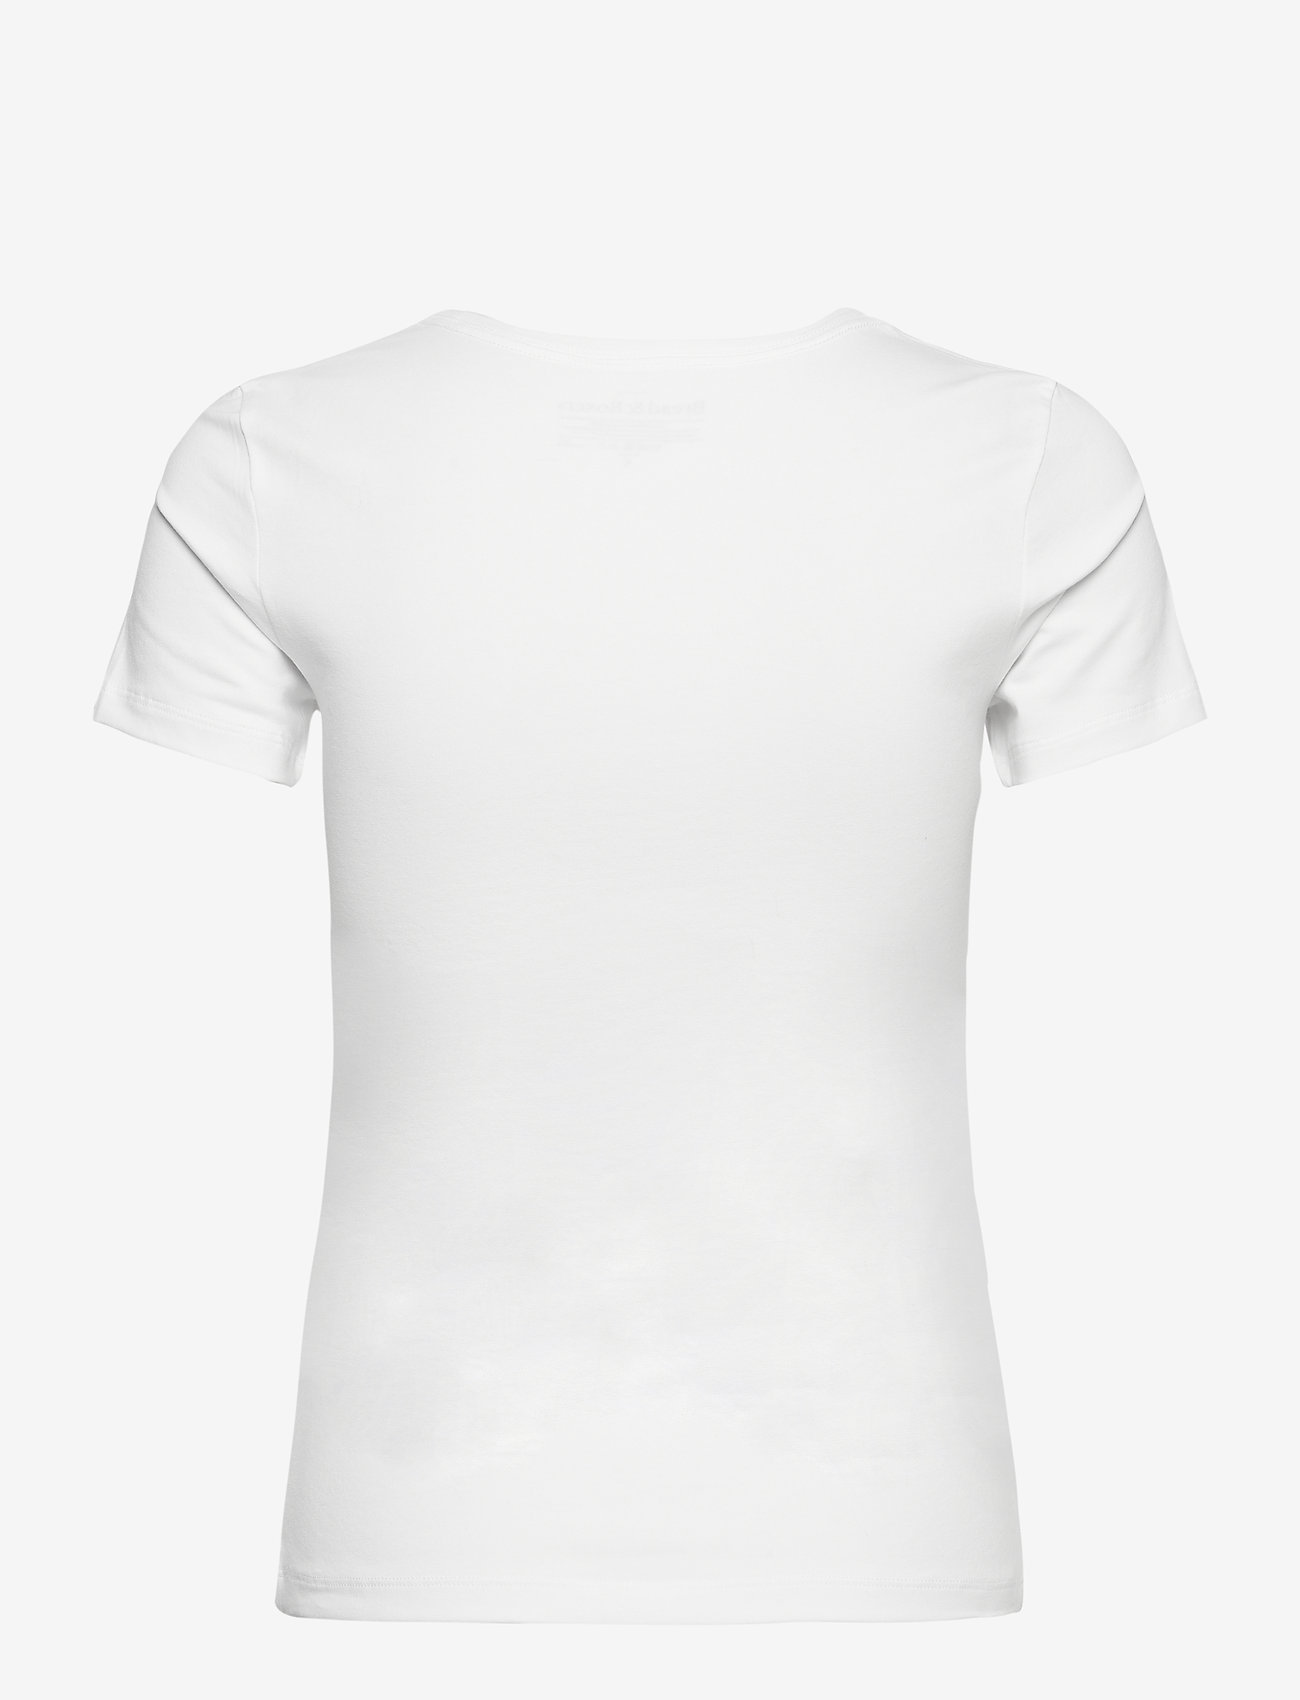 Bread & Boxers - T-shirts - t-shirts - white - 1